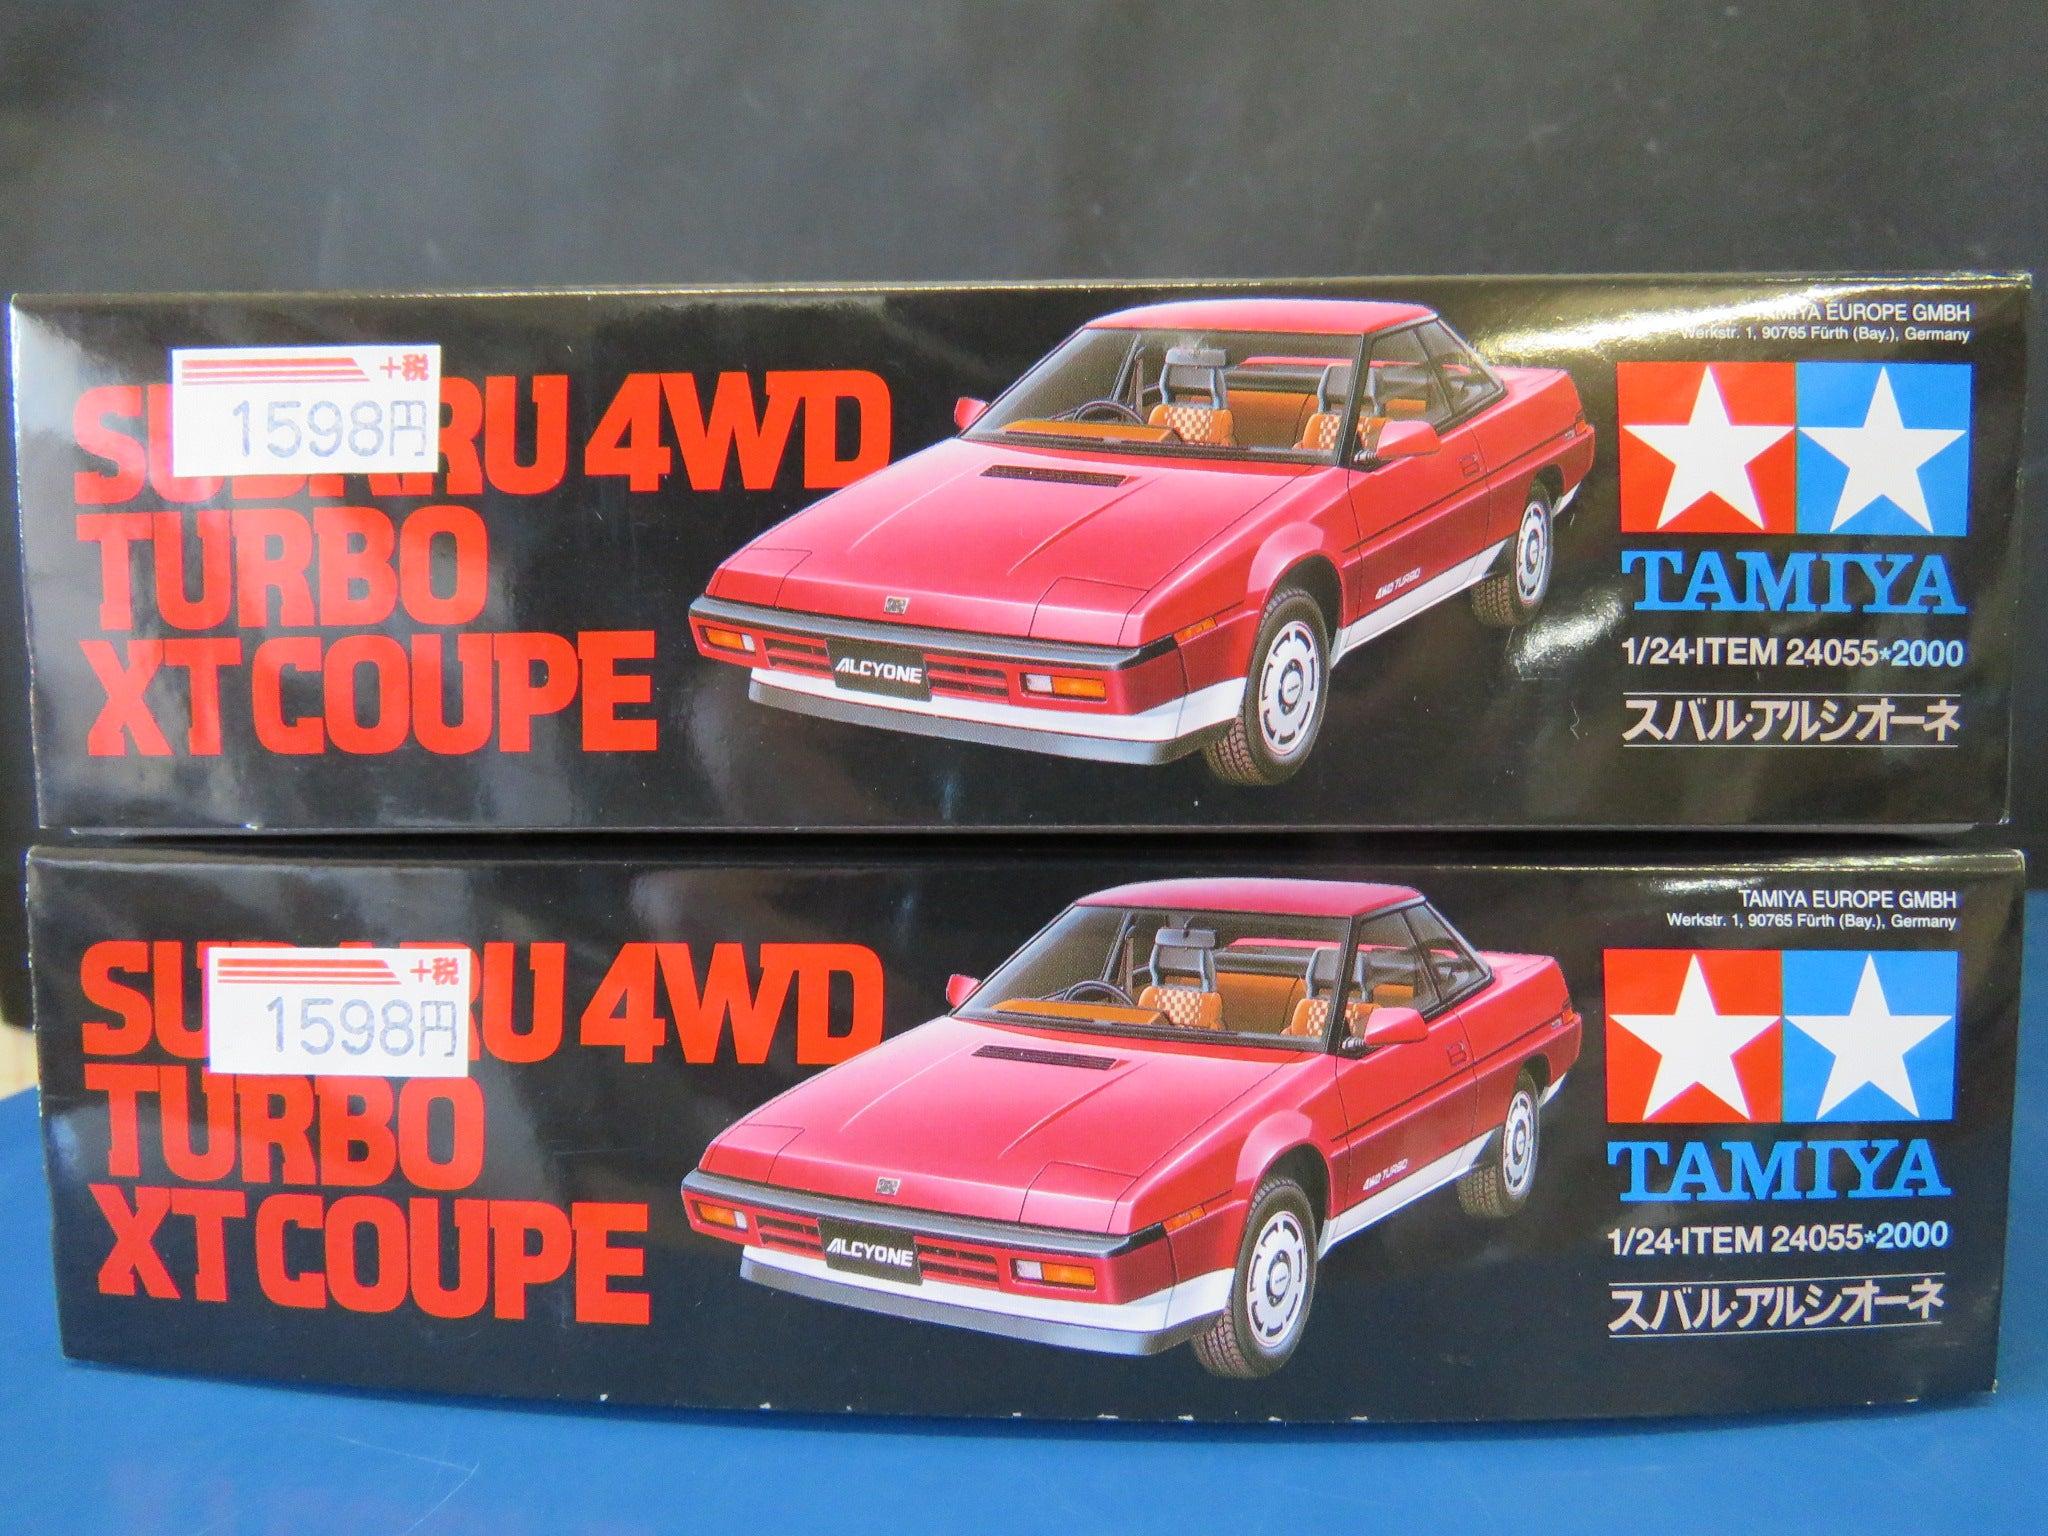 Japan flag rising sun sticker decal cars fun stickers van bumper decal 5344 red